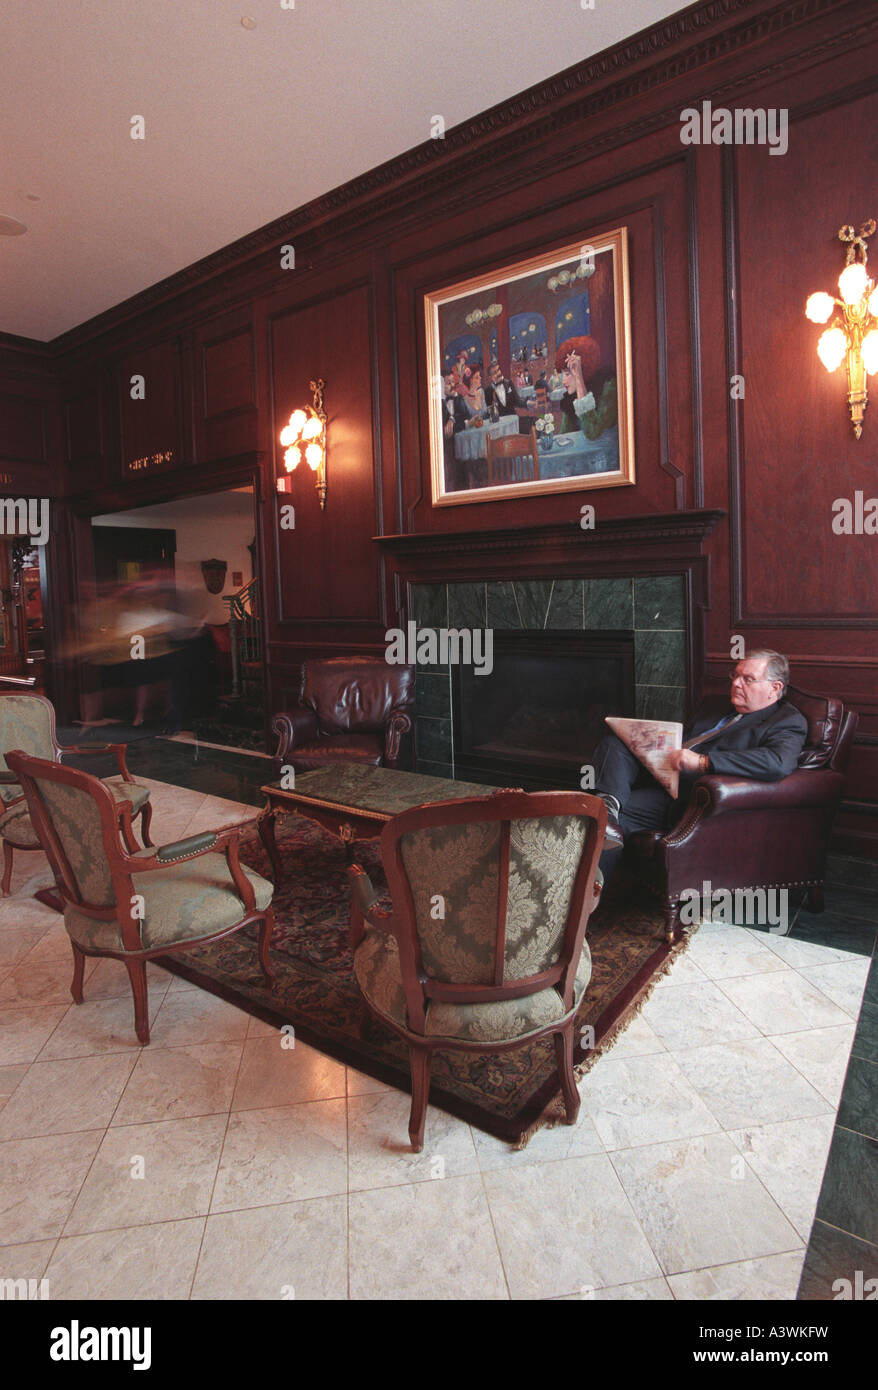 Landmark Inn lobby, Marquette Michigan - Stock Image